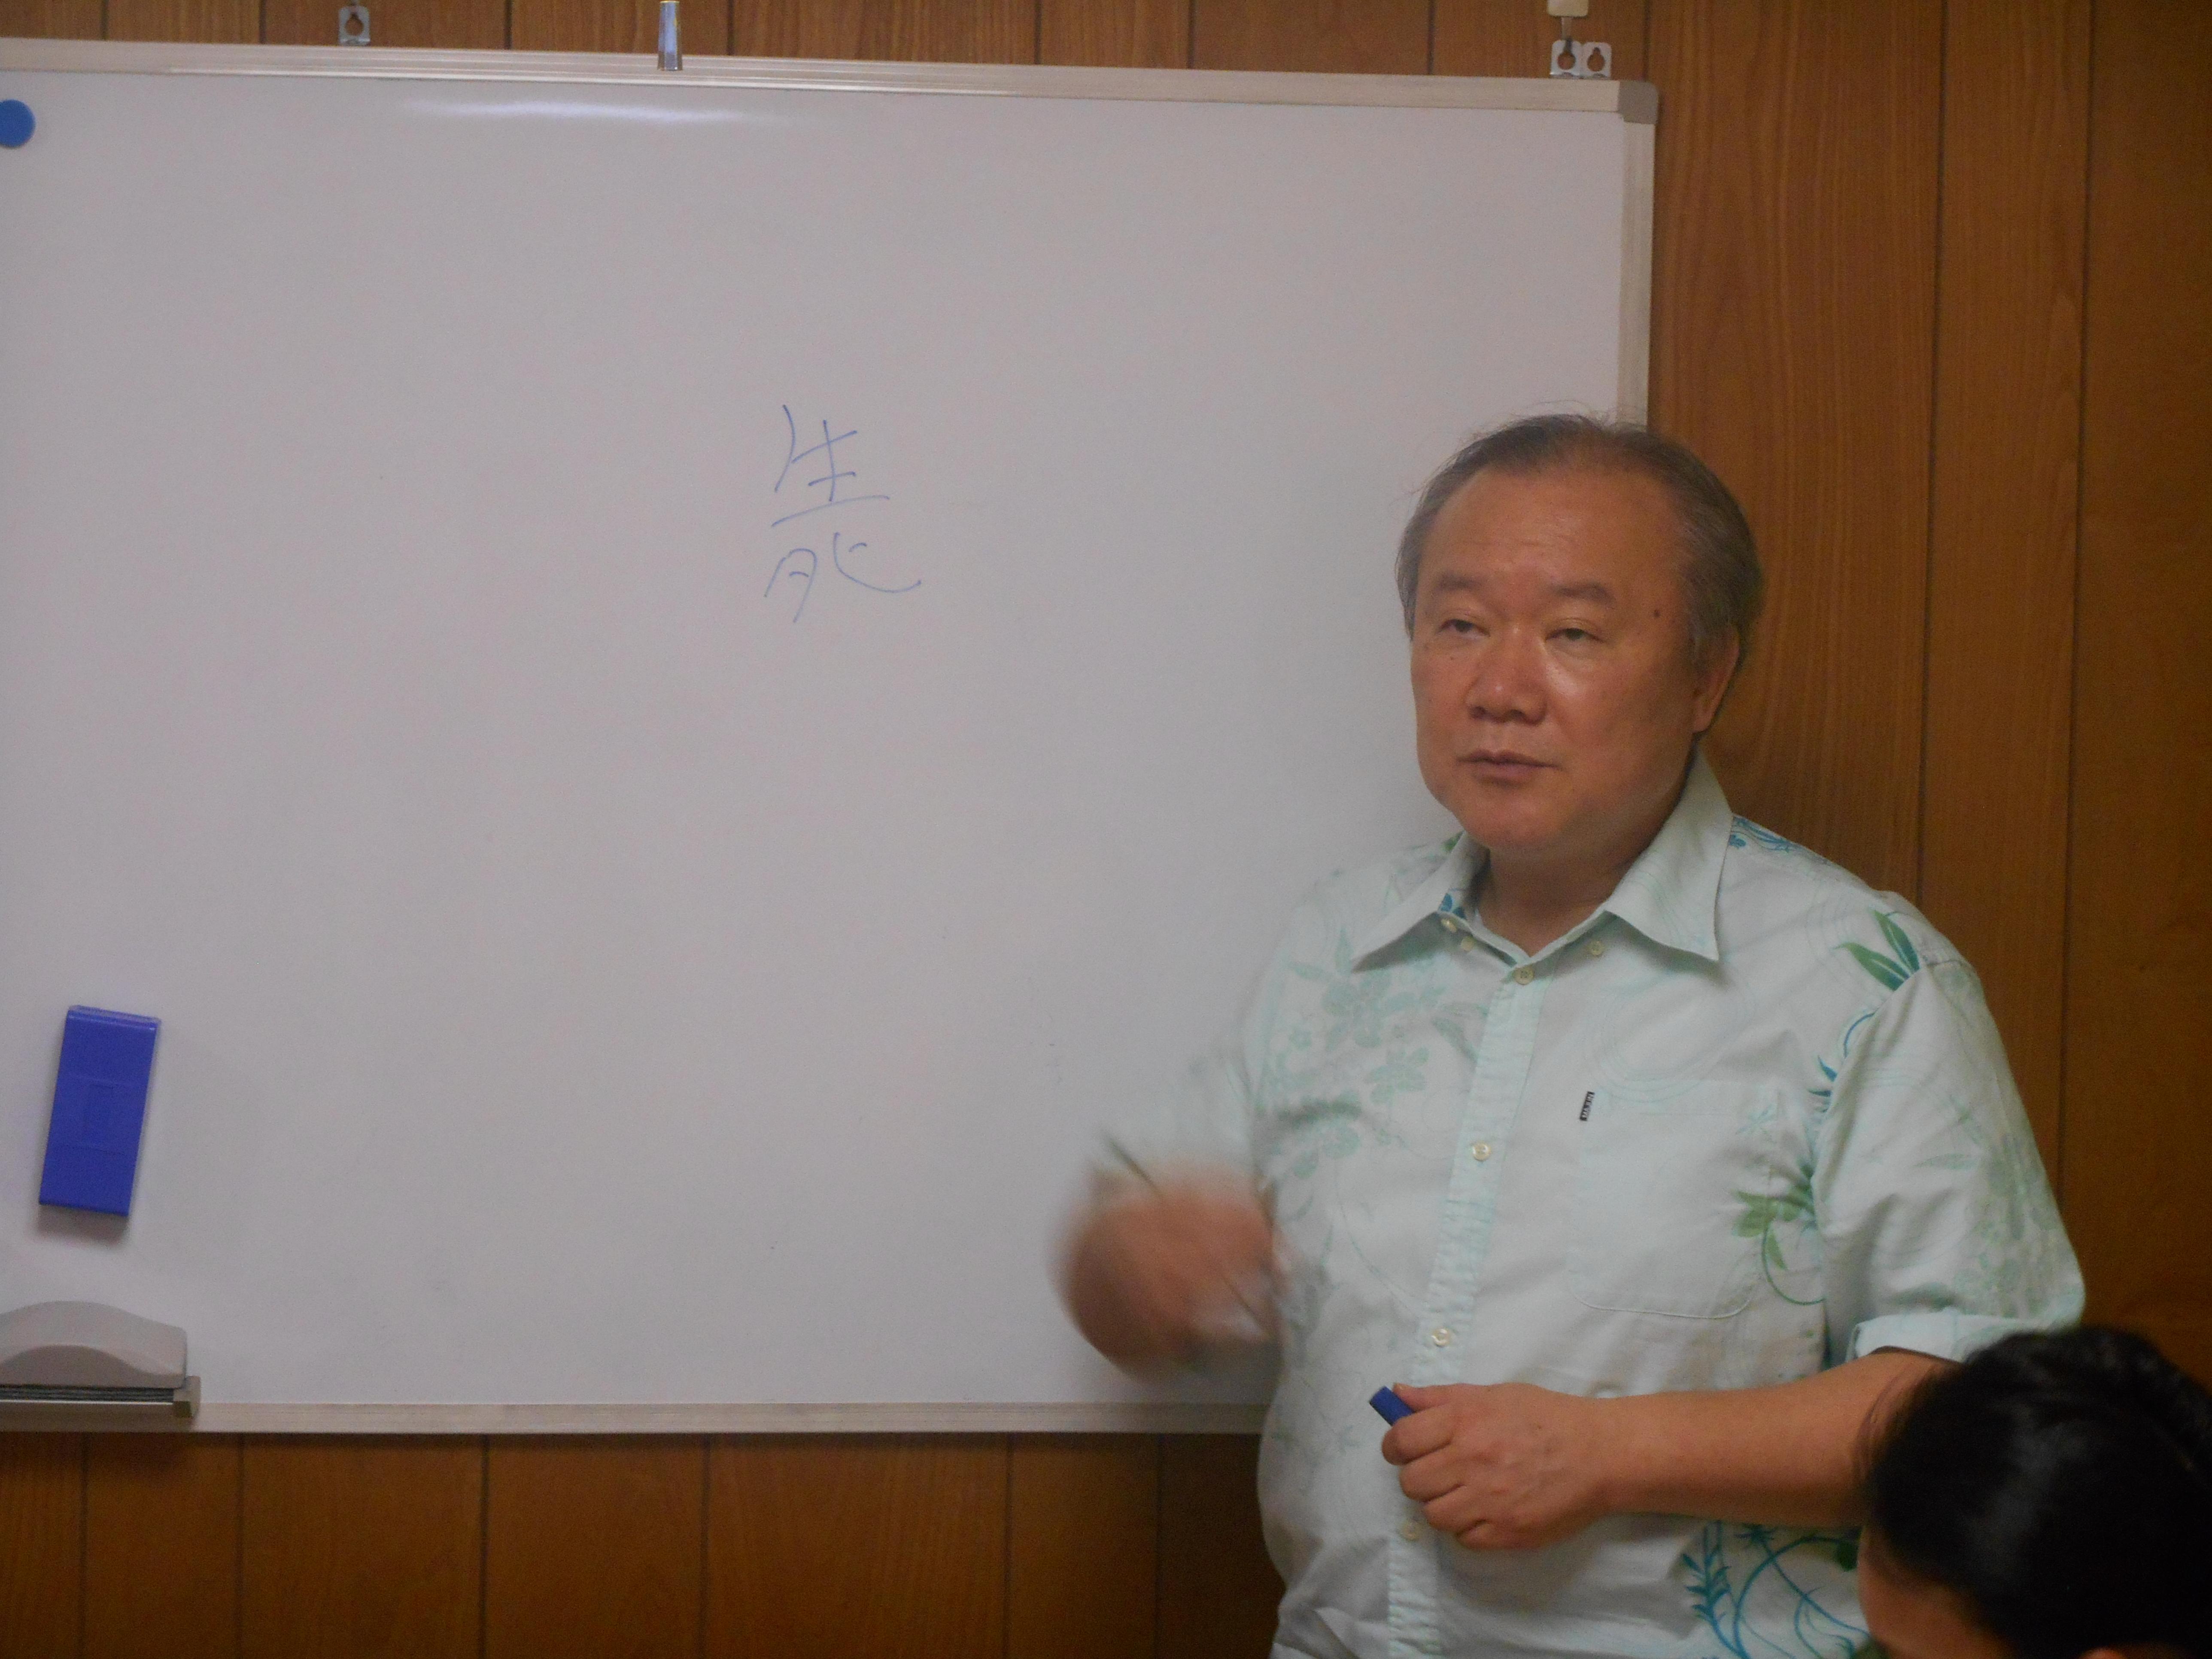 DSCN2032 - 池川明先生の愛の子育て塾第13期生(2018年8月~2018年12月)募集中です。